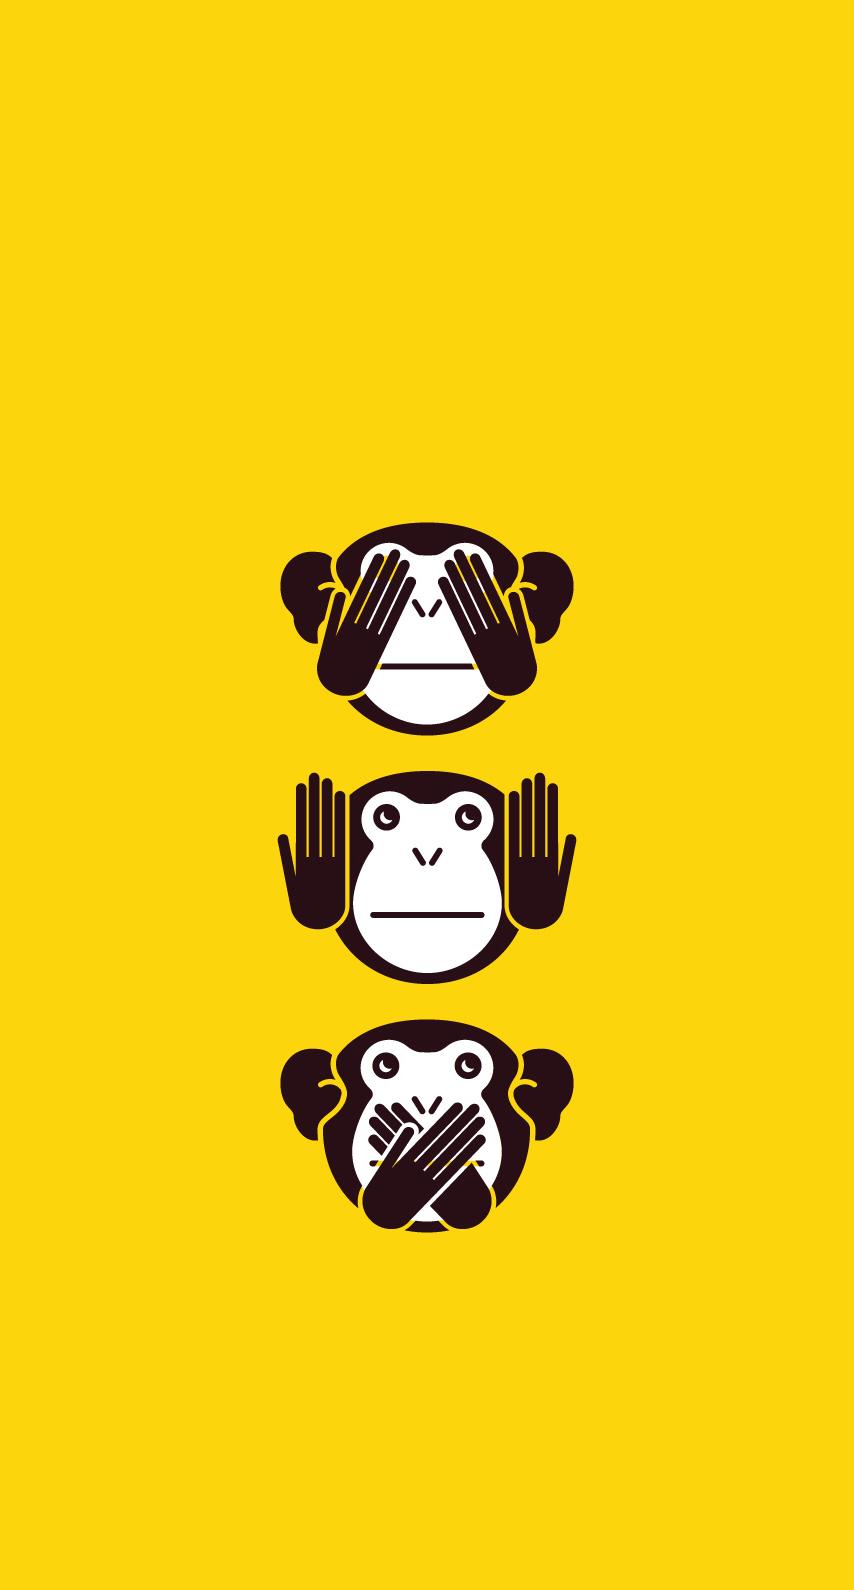 Fonds d 39 cran hd pour votre smartphone geekpratik for Fondos animados 2016